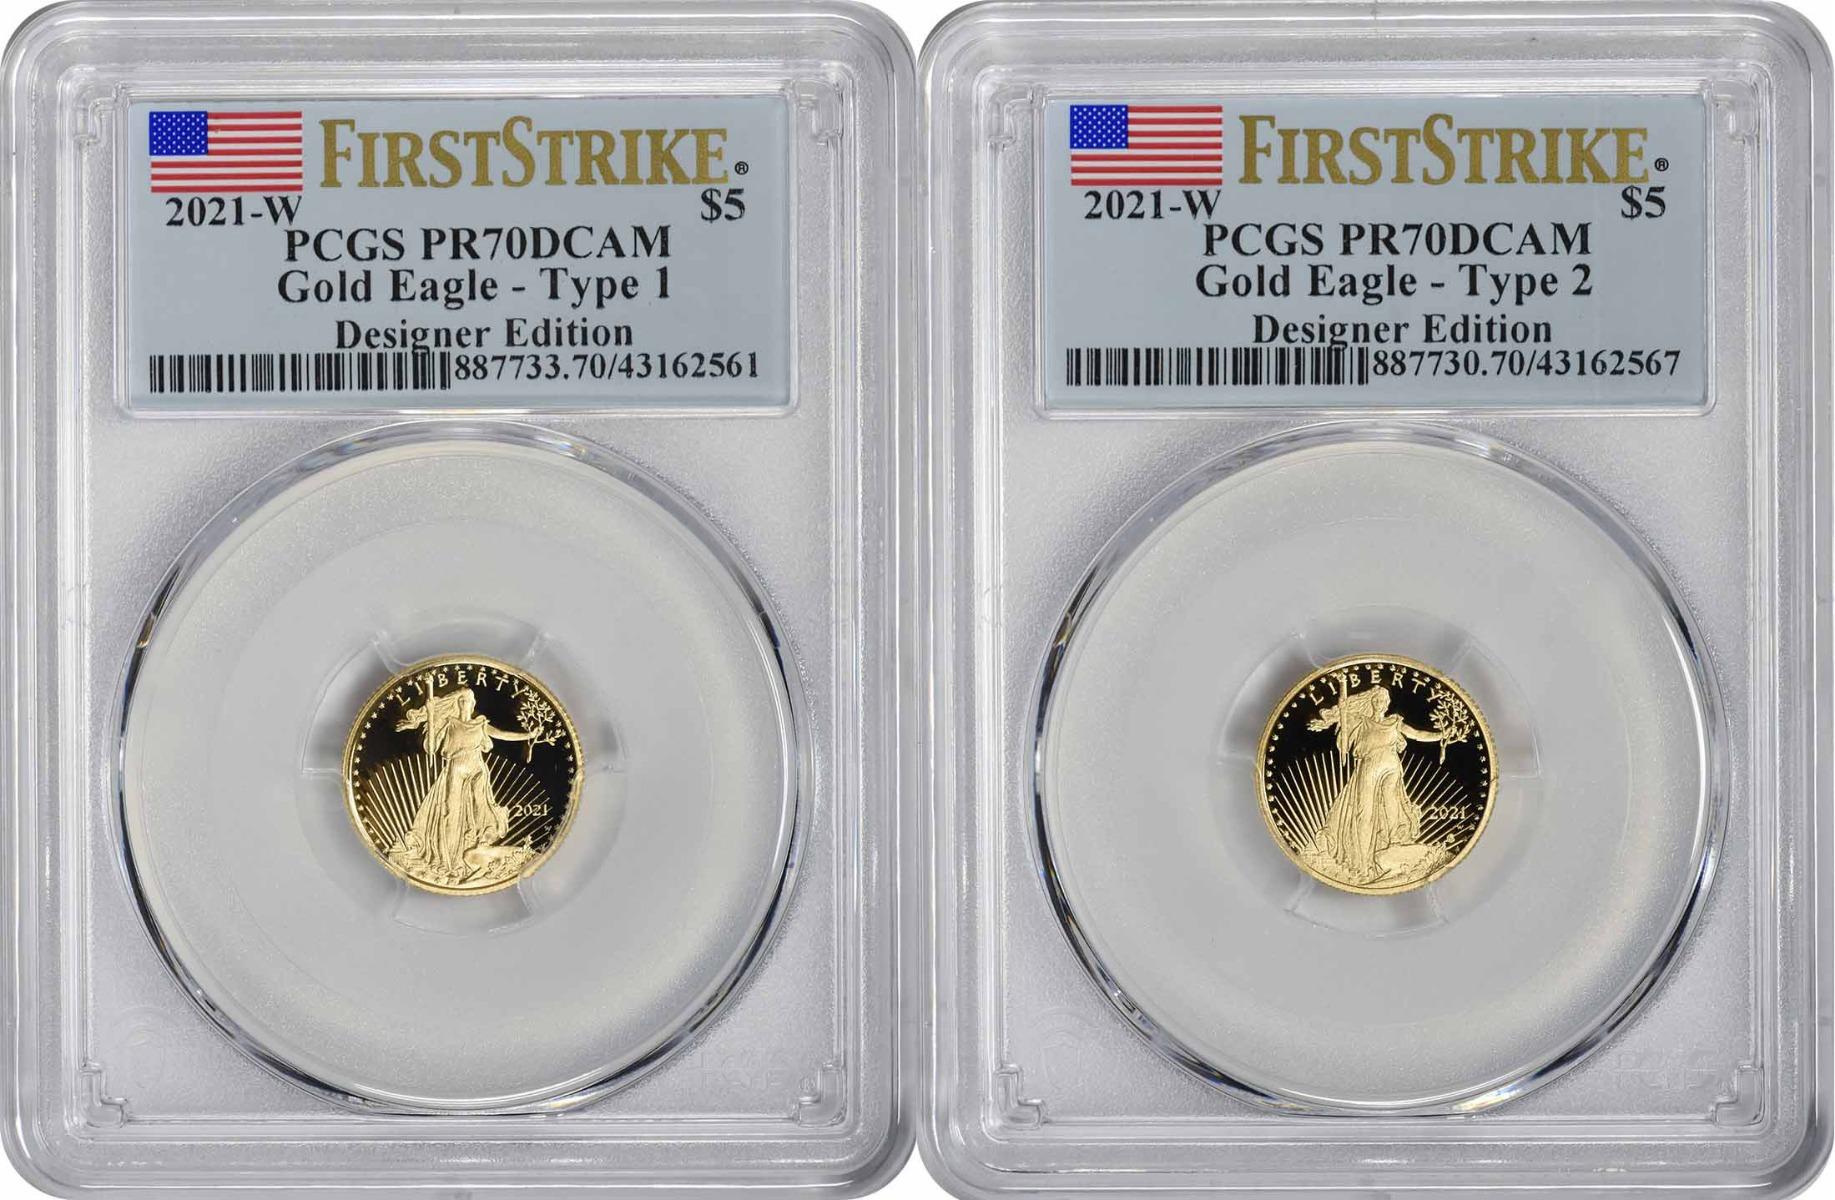 2021-W $5 American Gold Eagle Designer Edition 2-Coin Set PR70DCAM First Strike PCGS